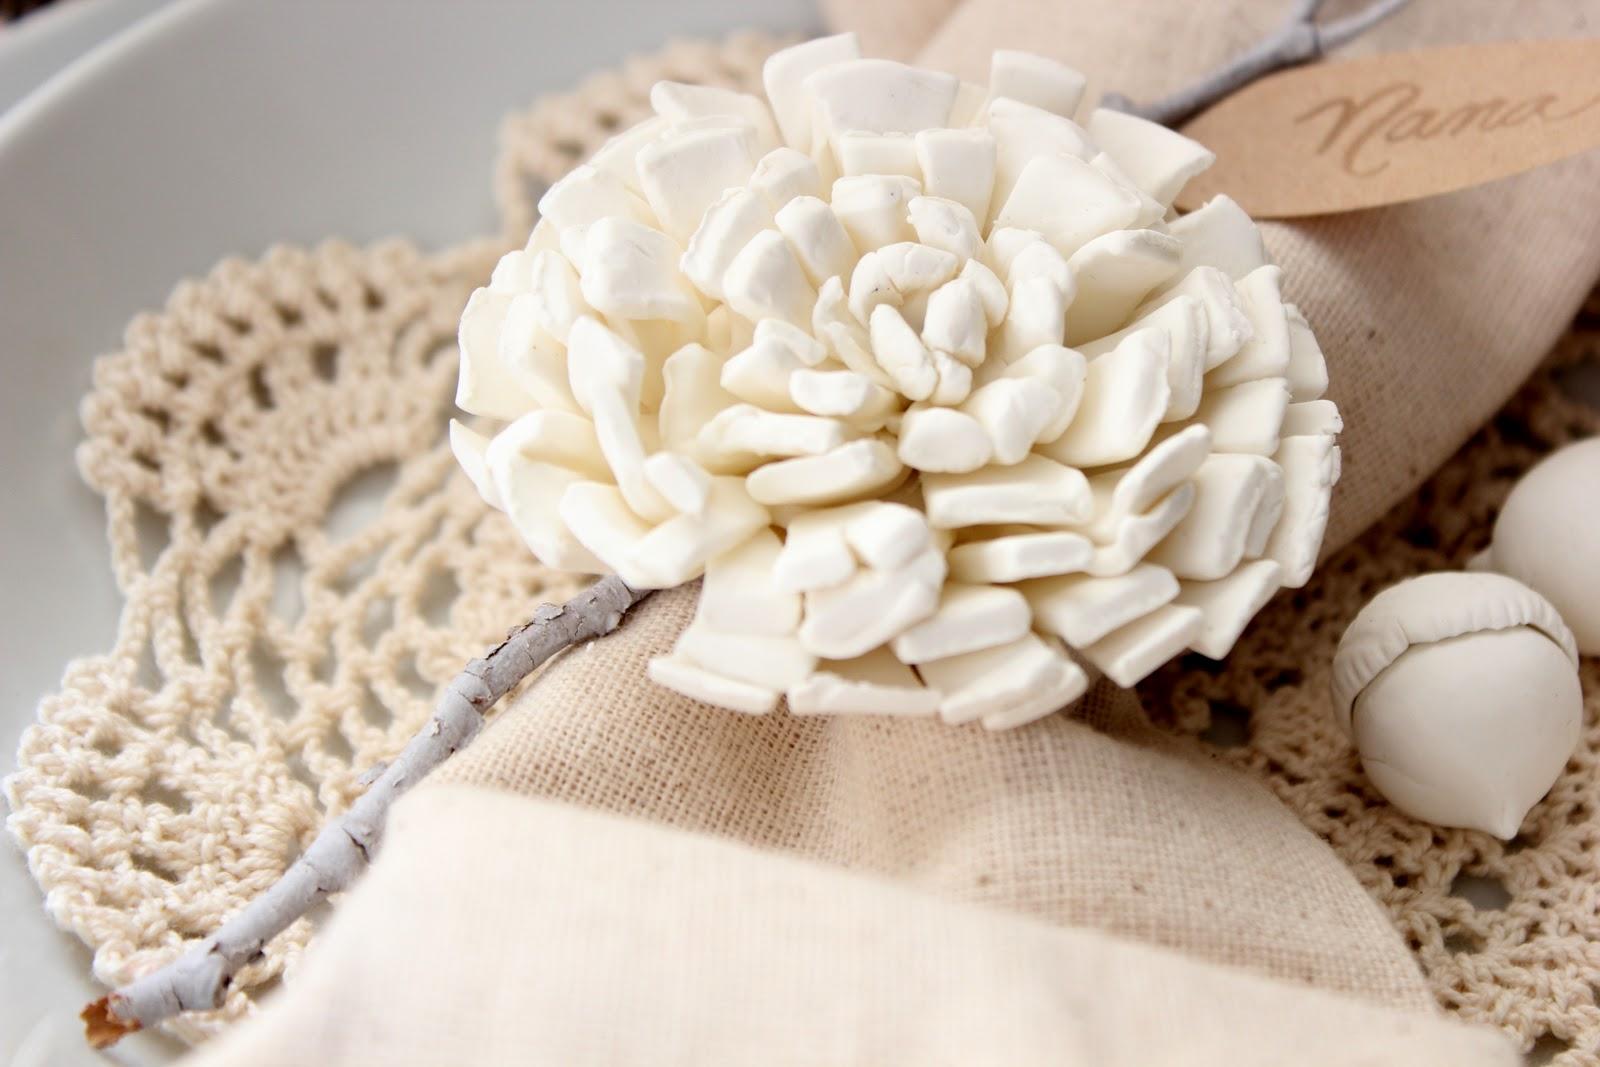 flower clay tutorial - photo #34